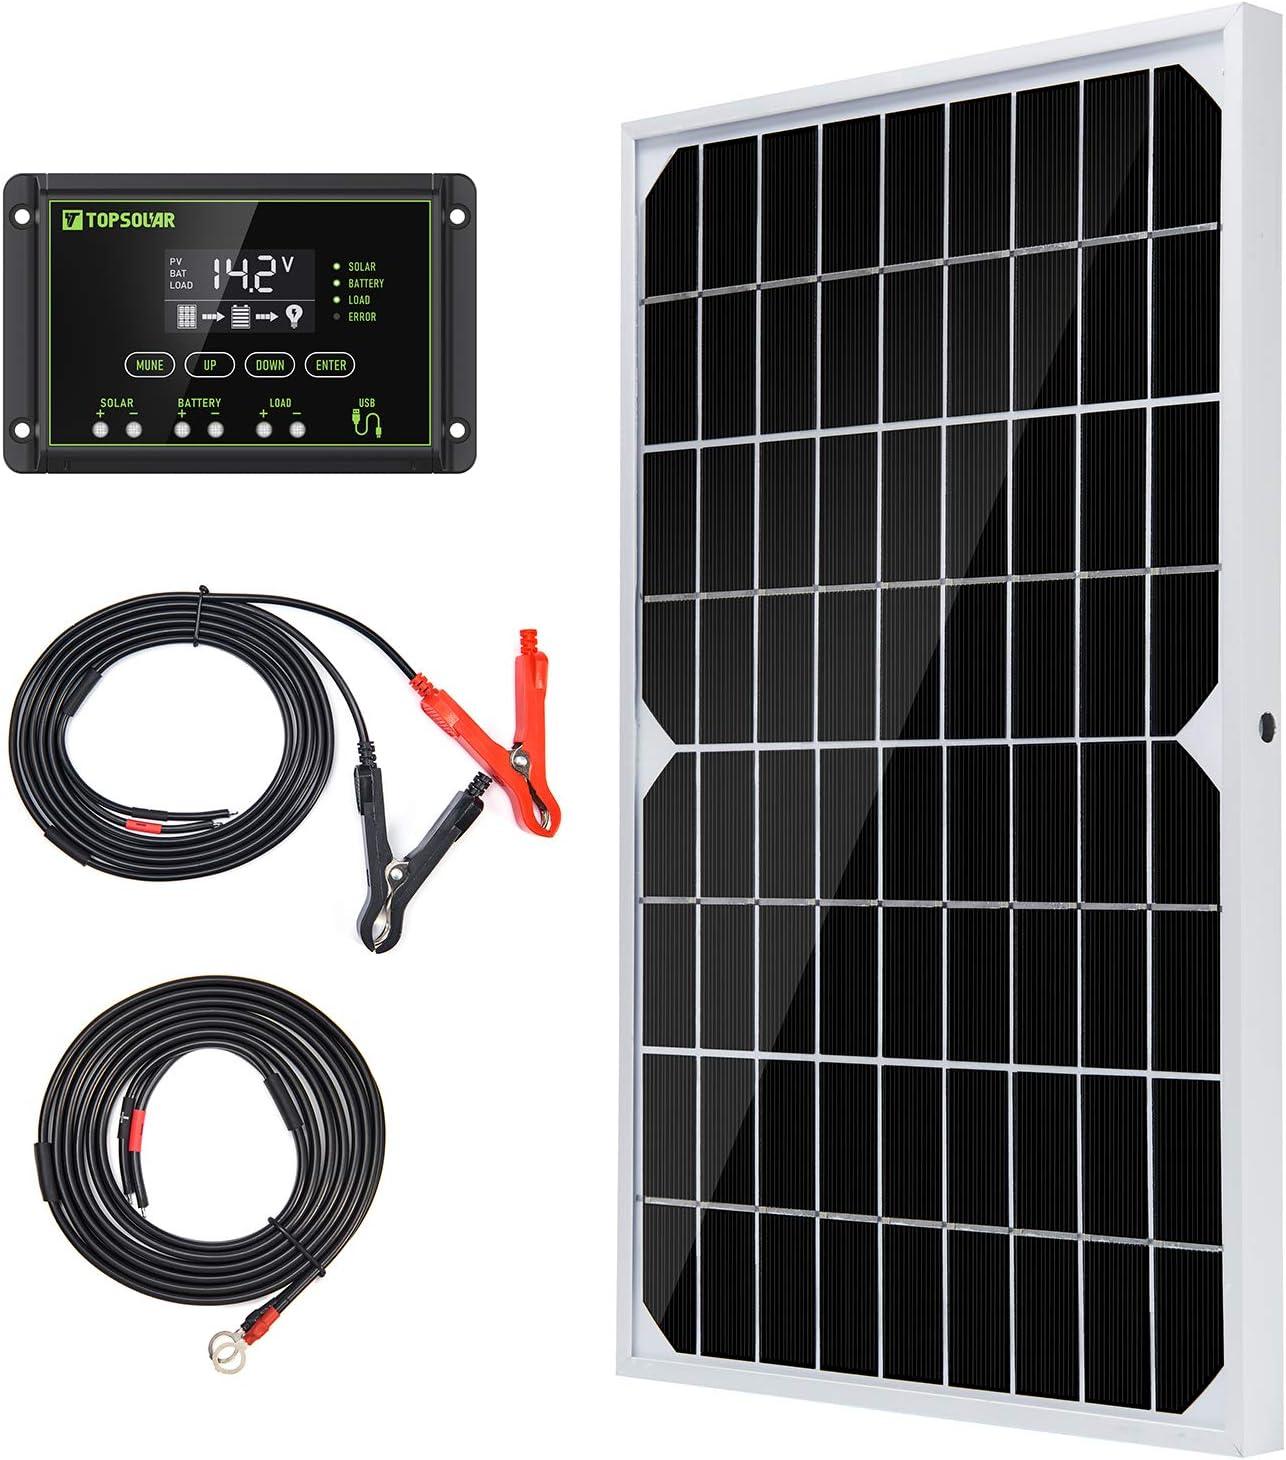 Topsolar Solar Panel Max 42% OFF Kit 10W with Max 70% OFF 10A 12V Monocrystalline